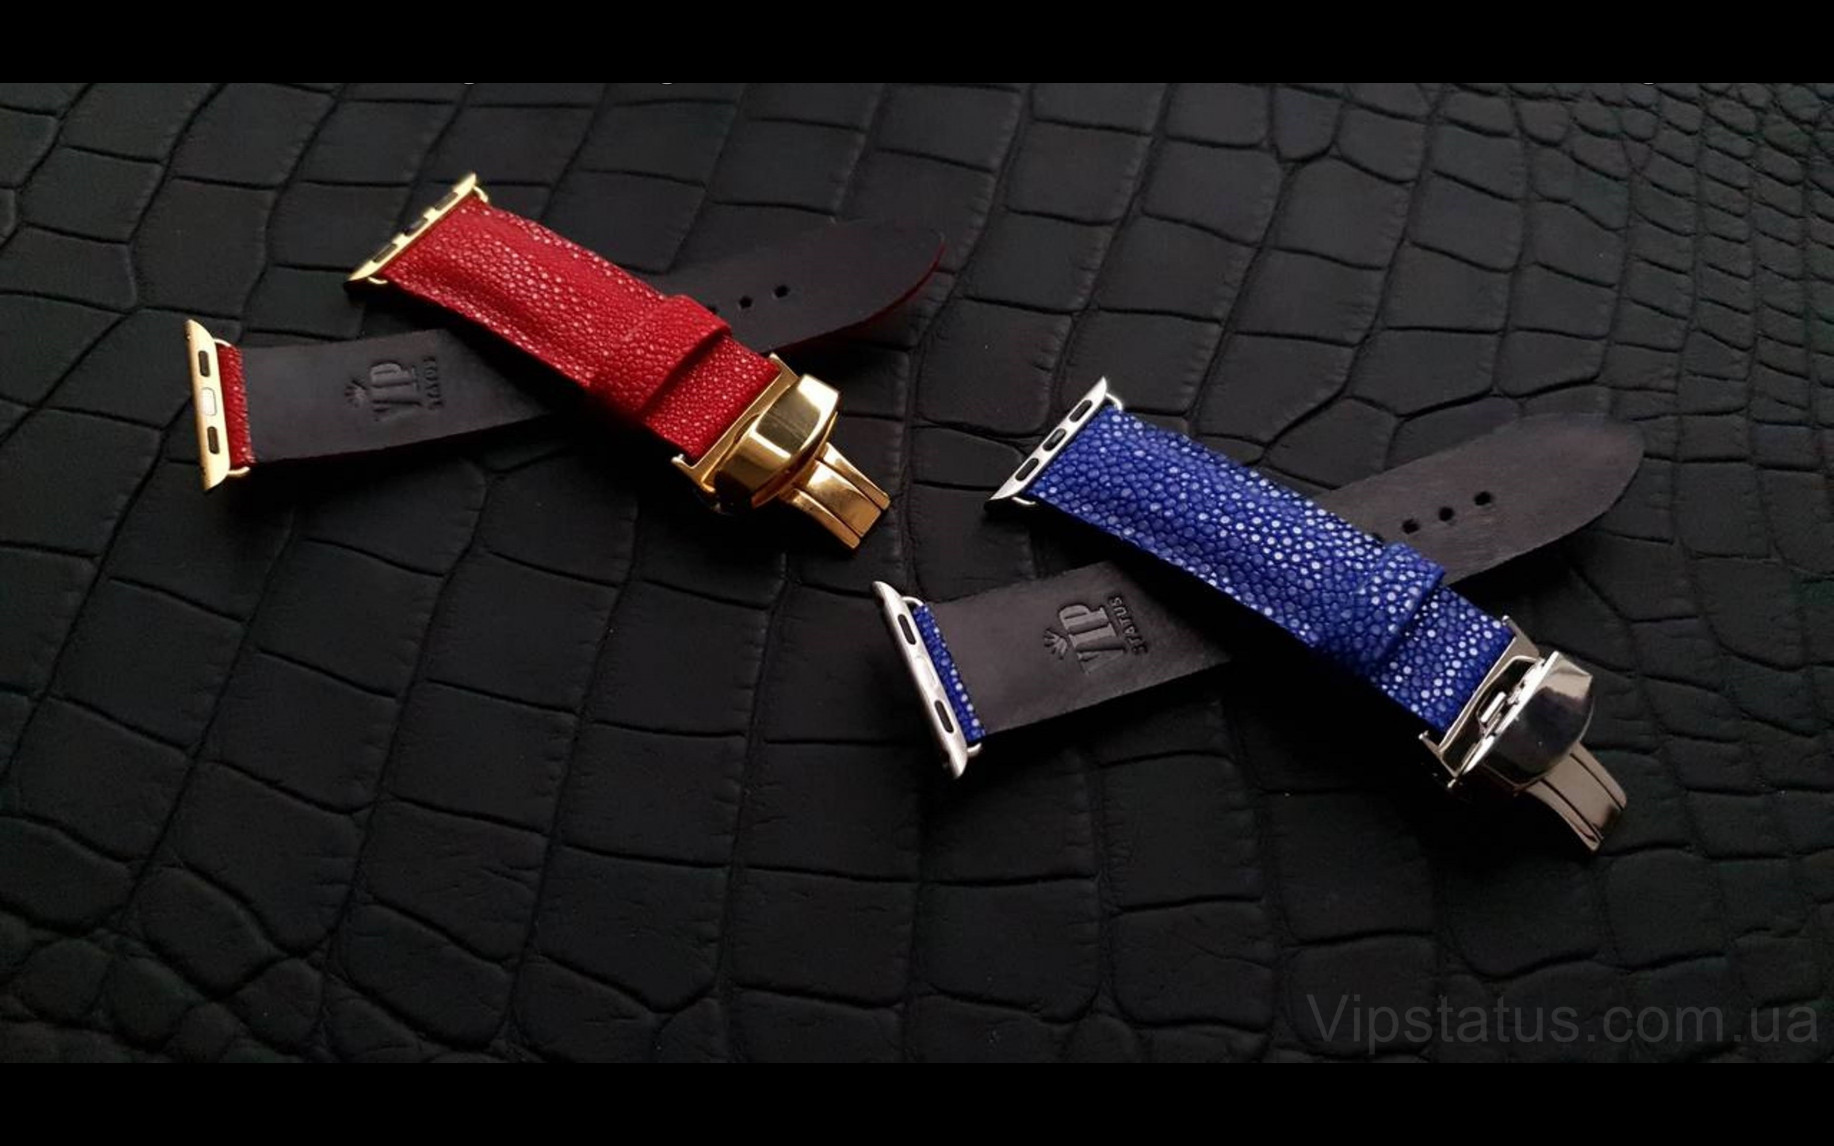 Elite Премиум ремешок для часов Tiffany кожа ската Premium Stingray Leather Strap for Tiffany watches image 4